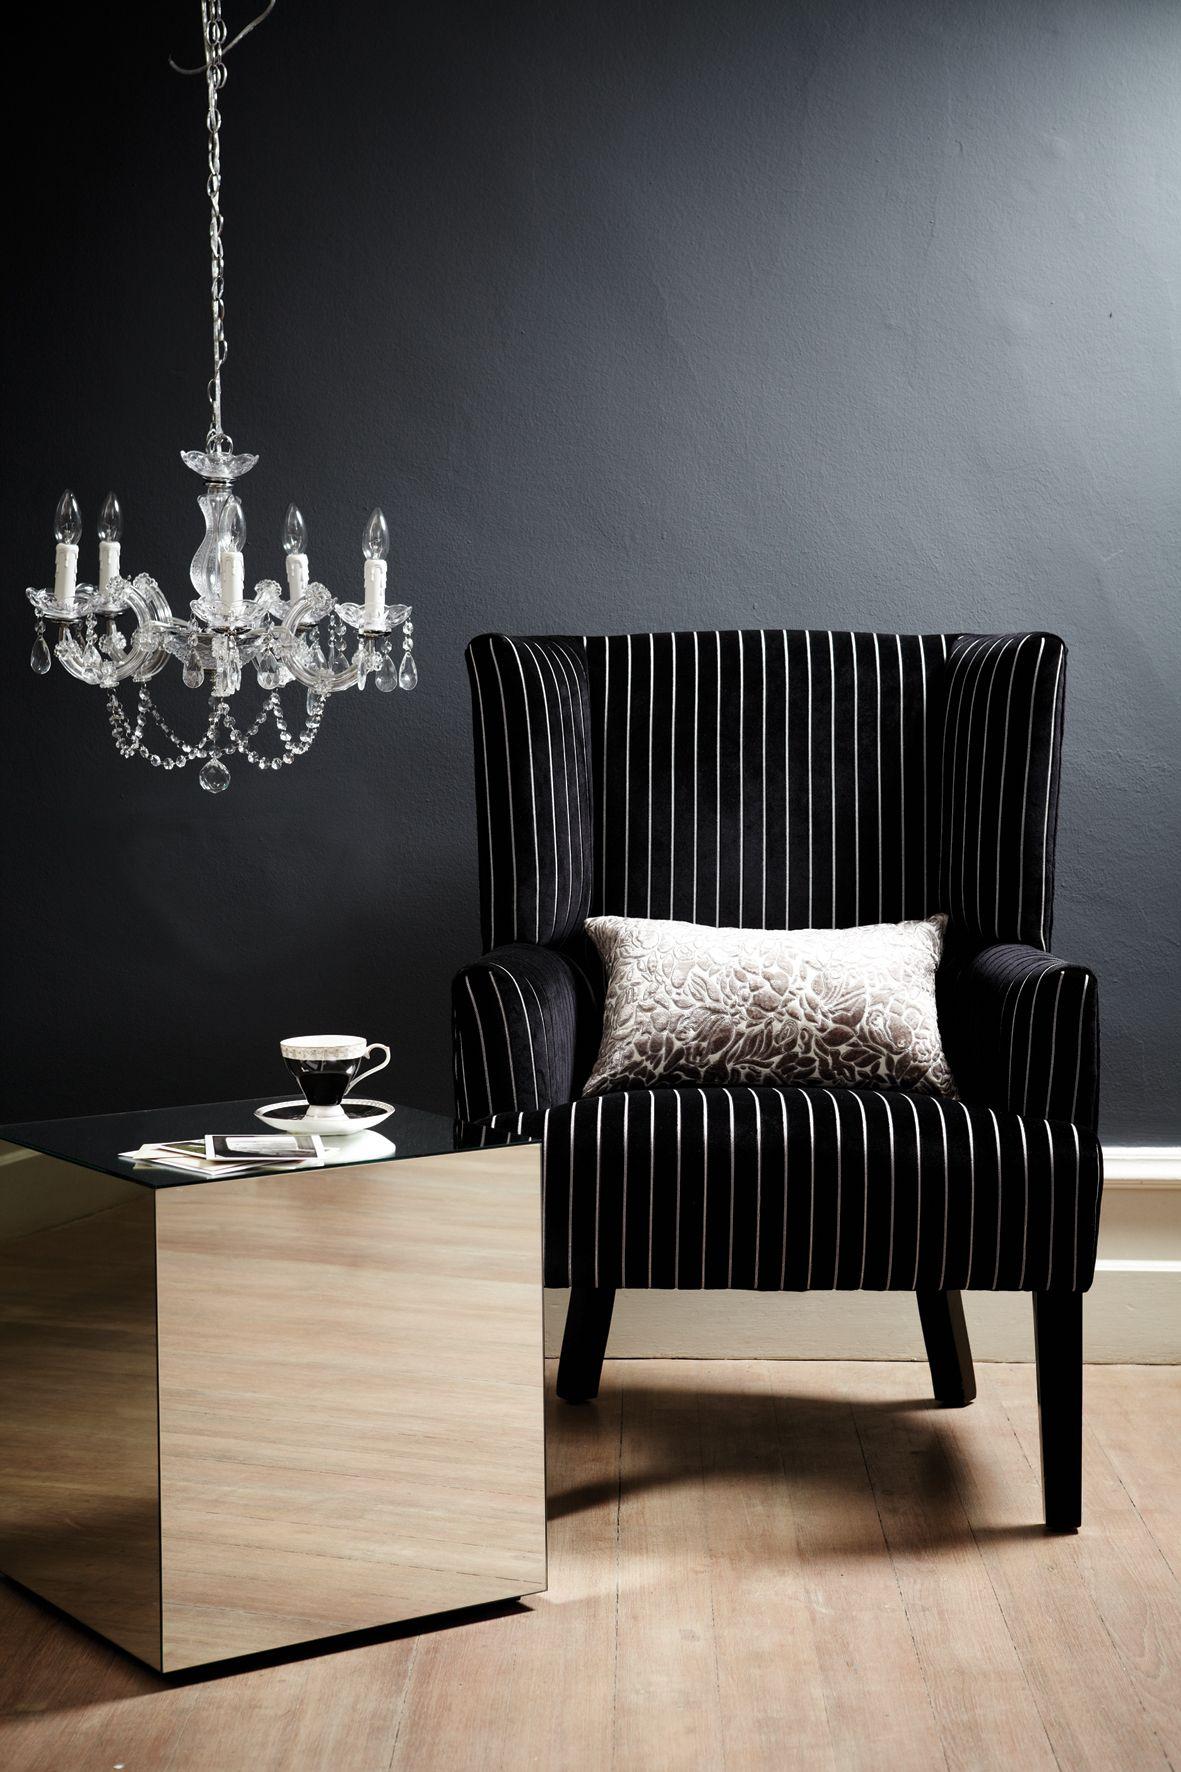 'Dark Indulgence' home's Winter 2013 Collection